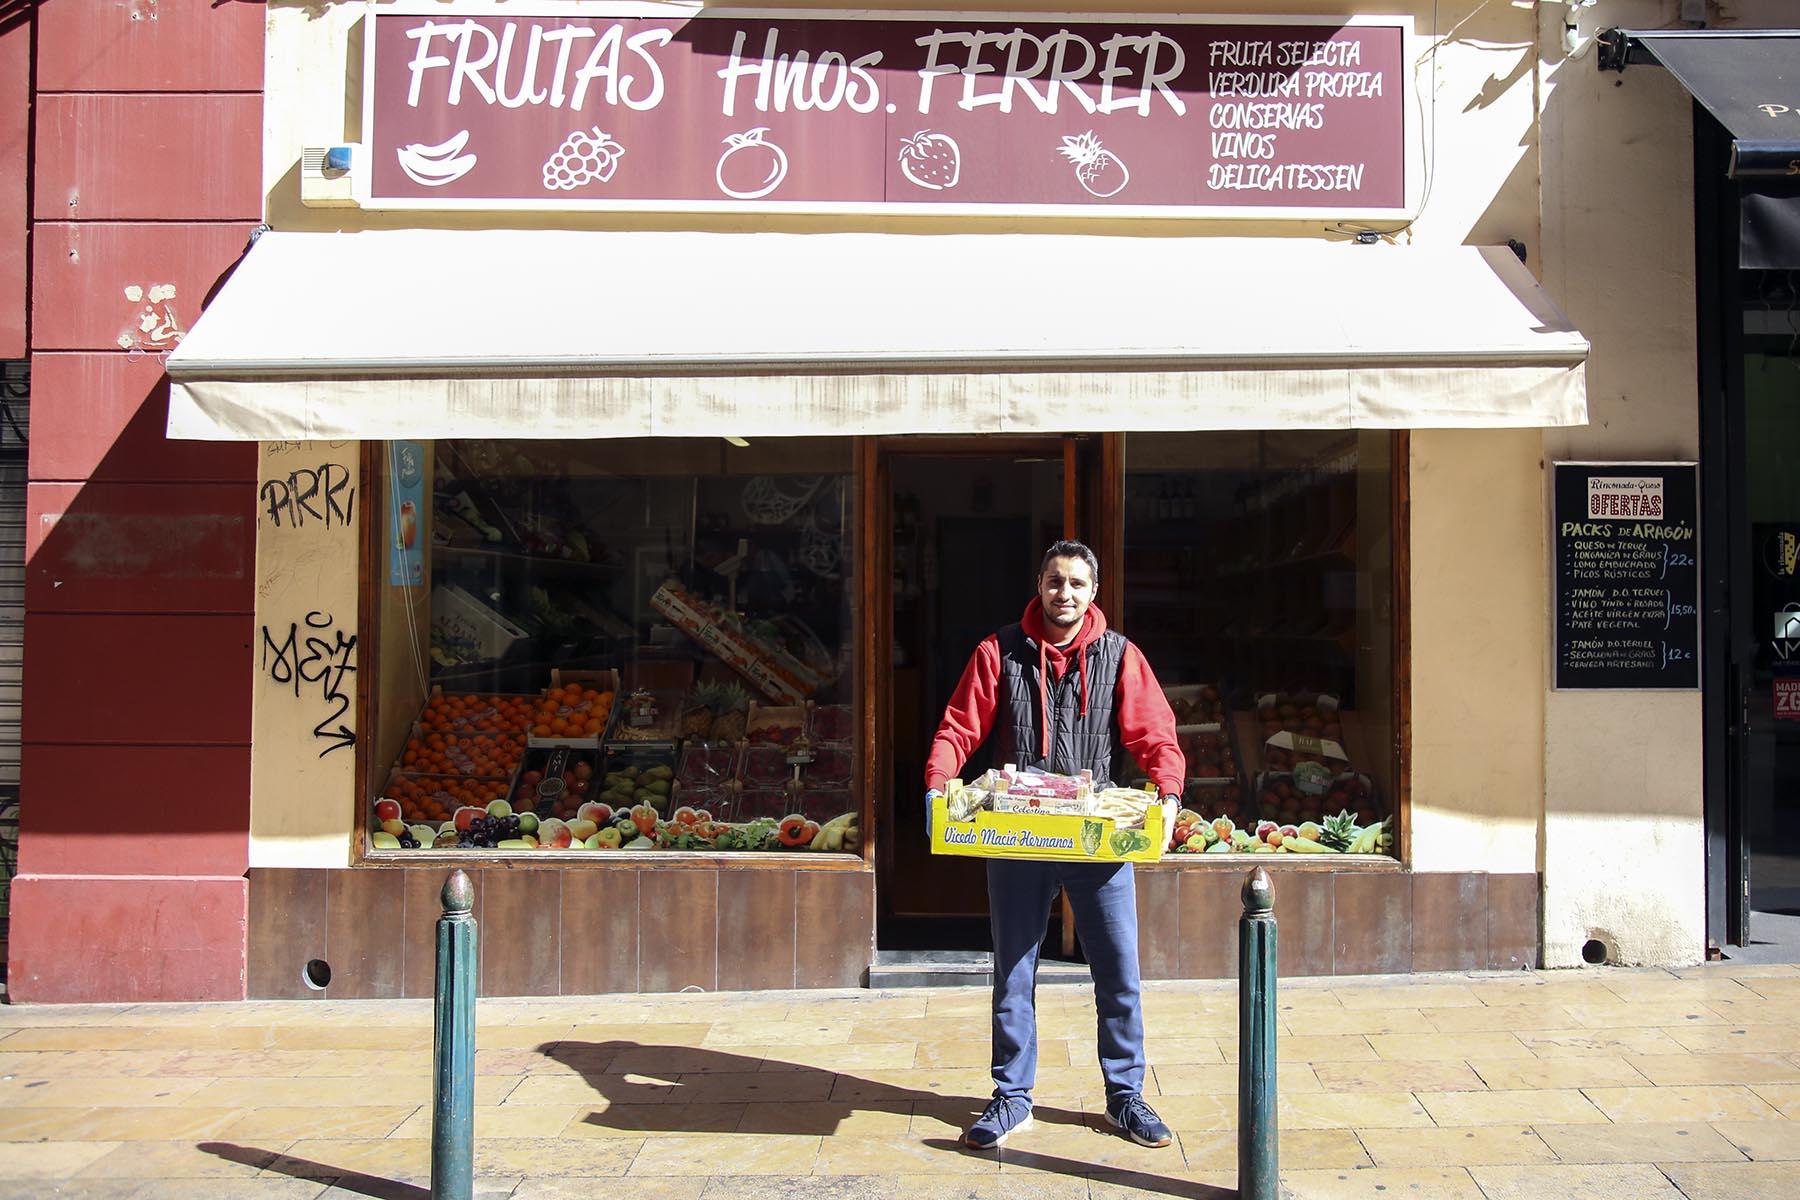 frutasferrer-online